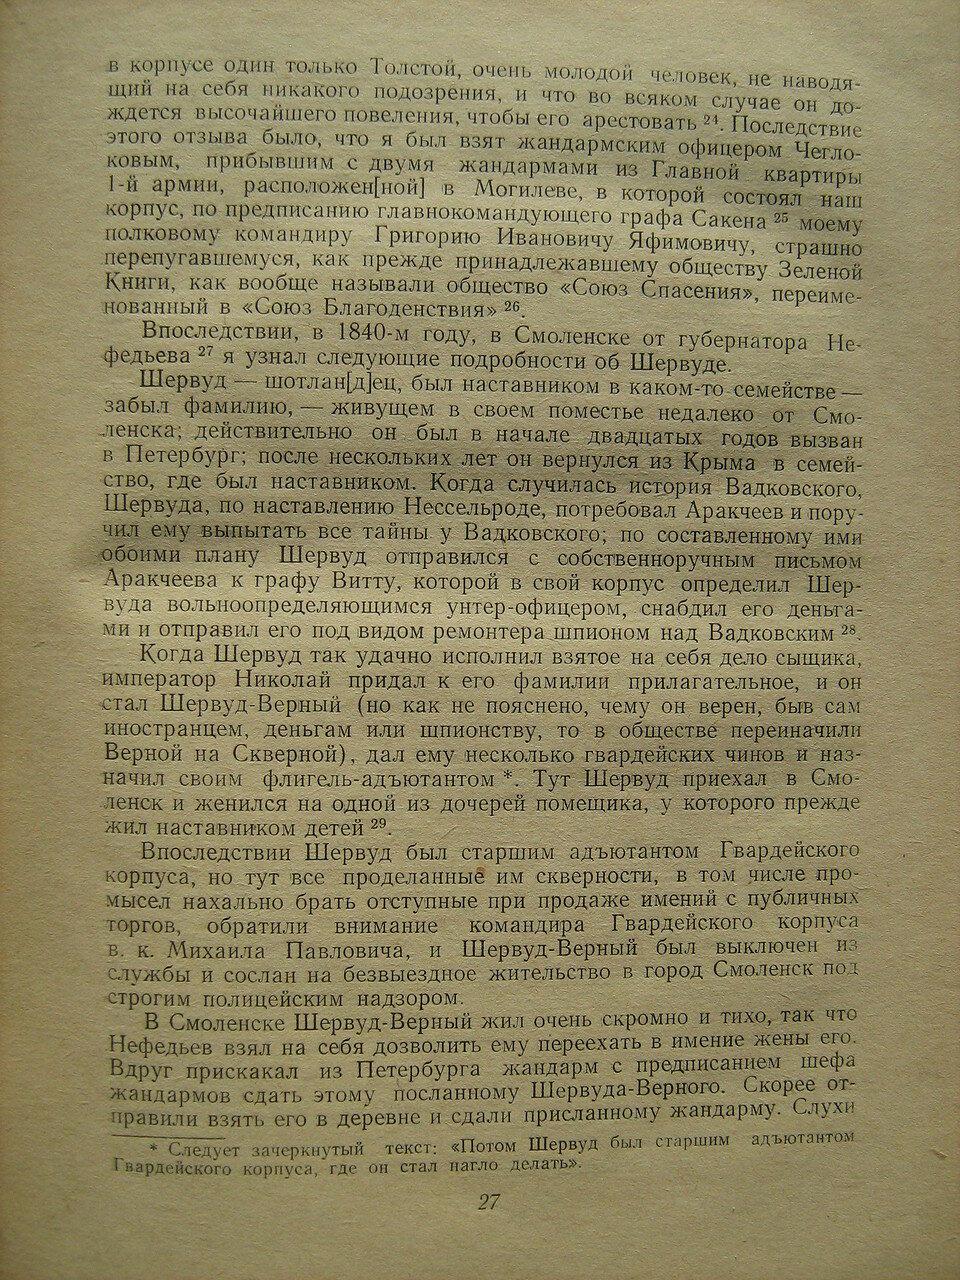 https://img-fotki.yandex.ru/get/369167/199368979.df/0_21f758_7aebf804_XXXL.jpg